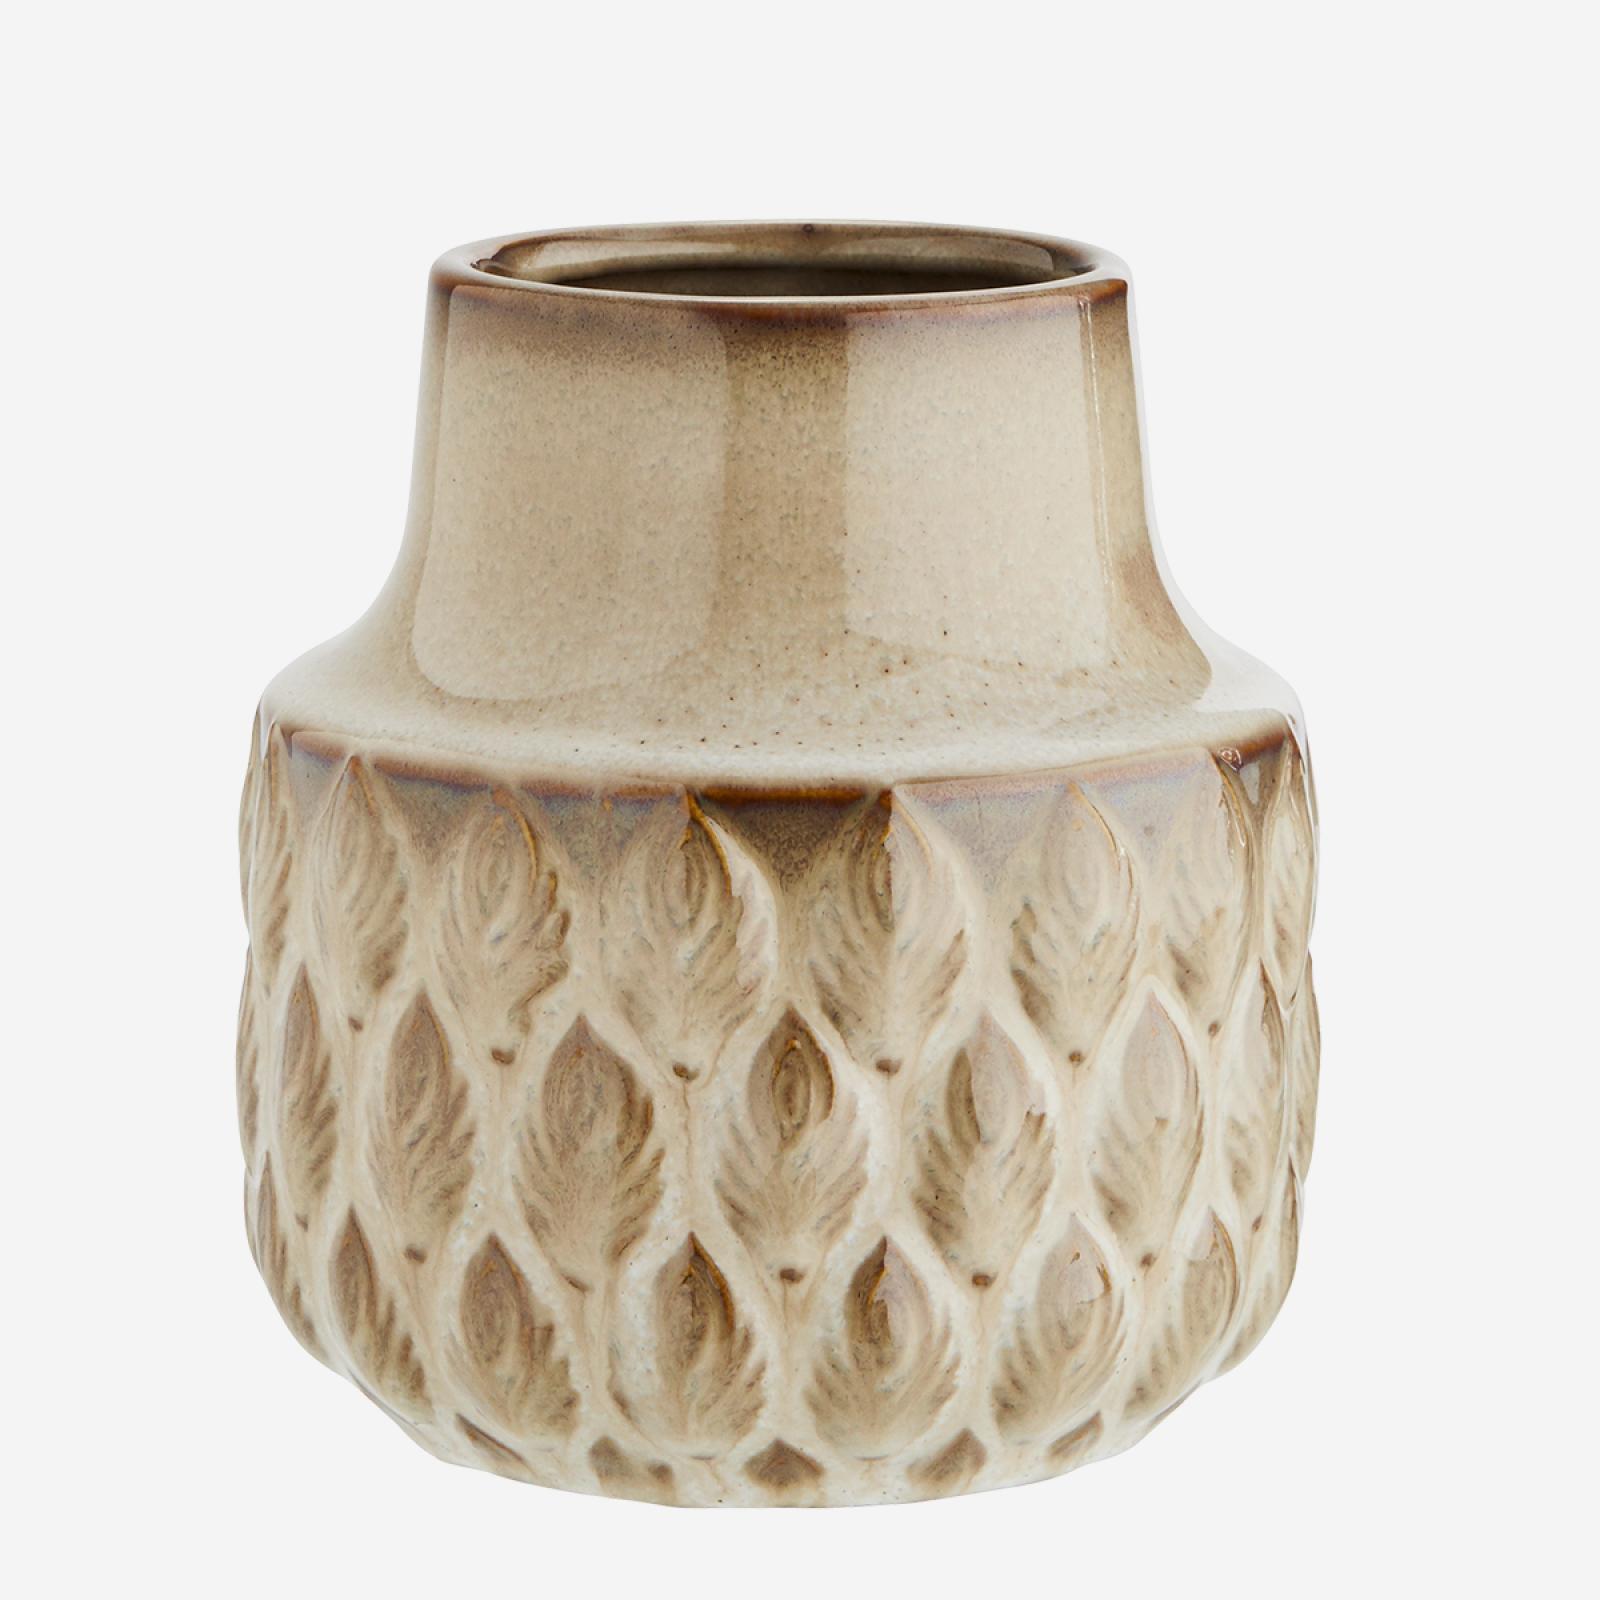 Beige Stoneware Vase 12.5 x 13 cm